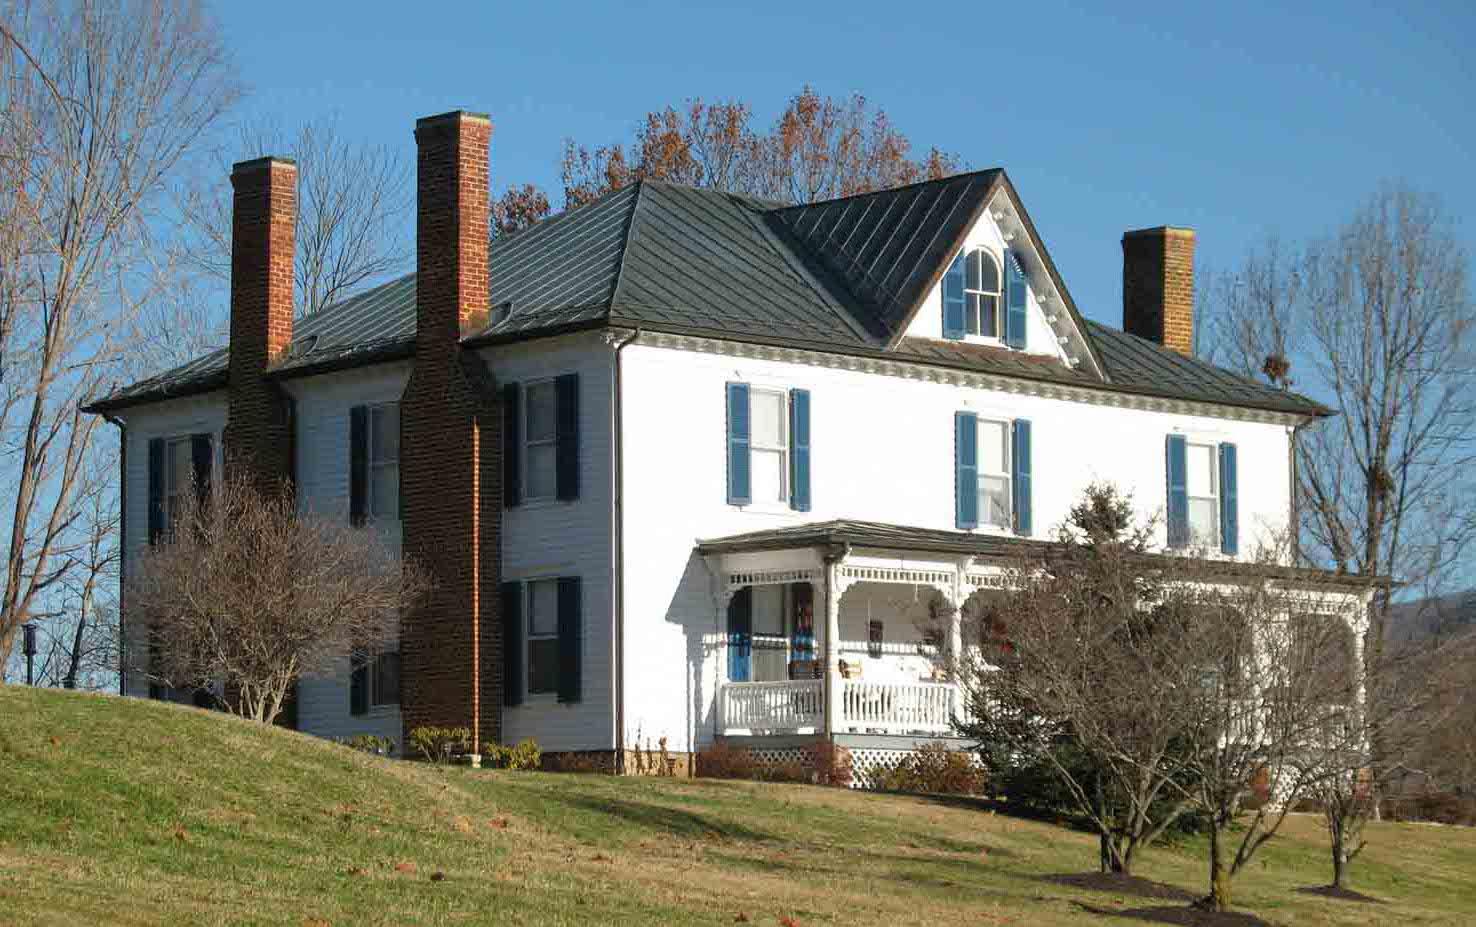 Fudge House